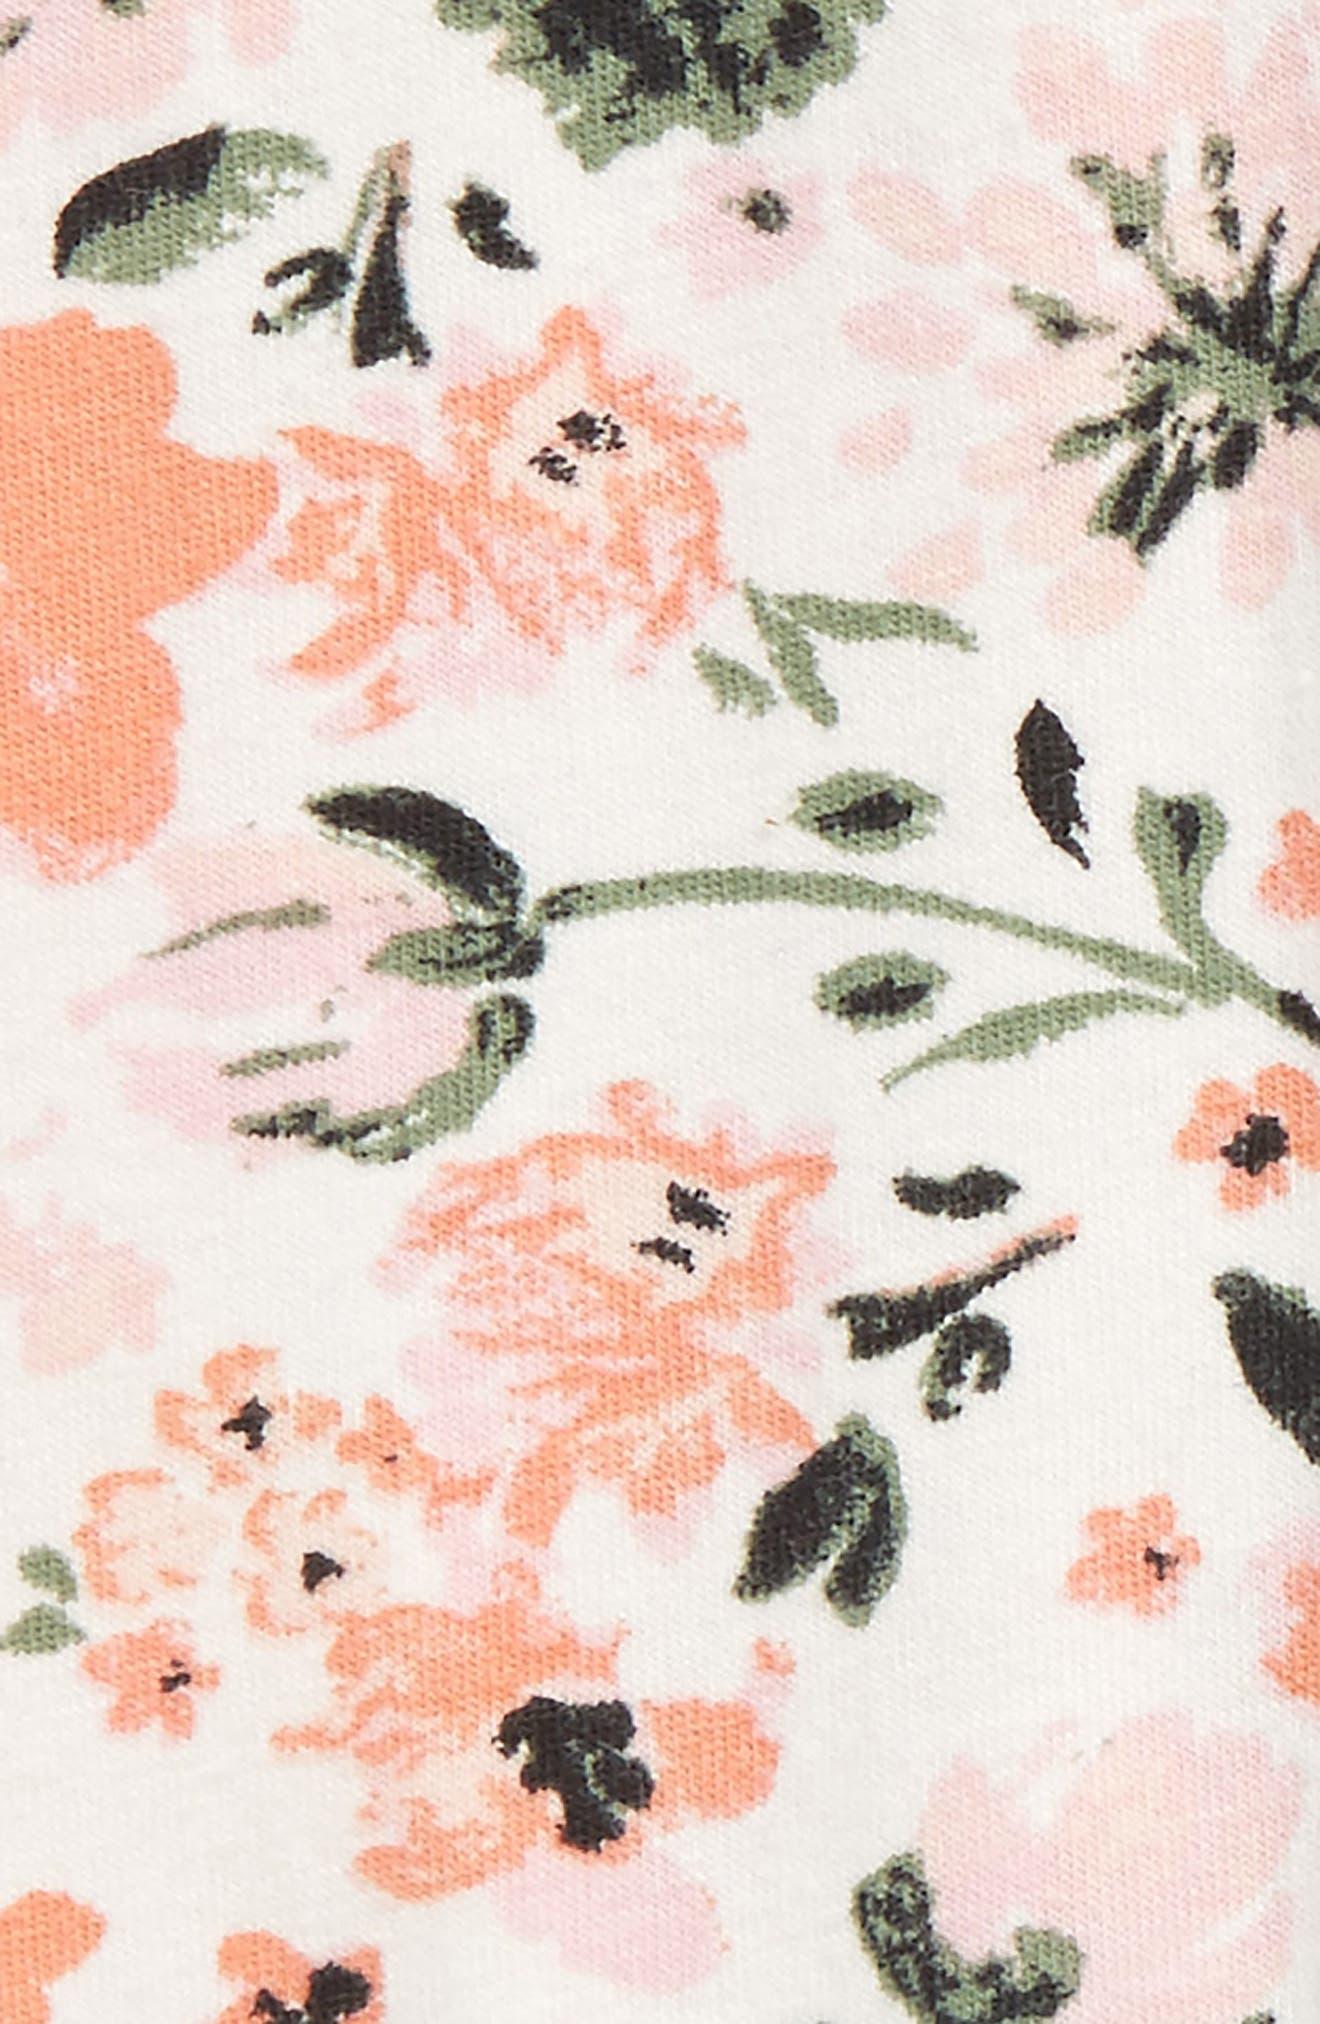 Floral Print Leggings,                             Alternate thumbnail 2, color,                             Ivory Egret Botanical Garden